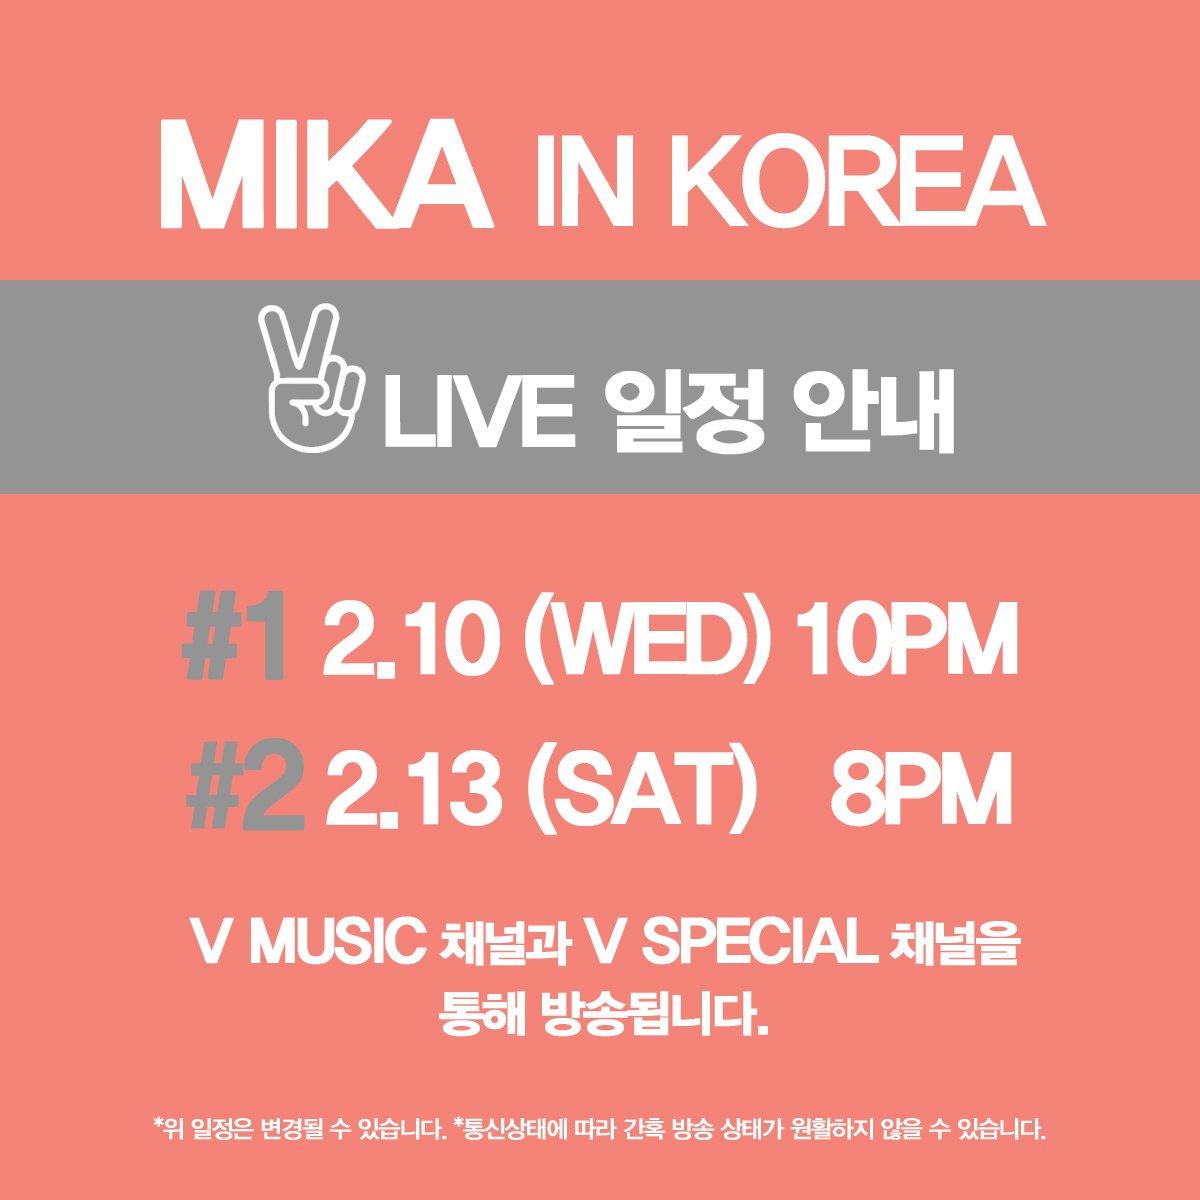 [#MIKA Live in Korea-V앱 생방송] ▶#1) 2.10(WED) 10PM https://t.co/QQhfzvJNSh ▶#2) 2.13(SAT) 8PM https://t.co/ZfdKHNiX5u https://t.co/KIs5xbHhZ9